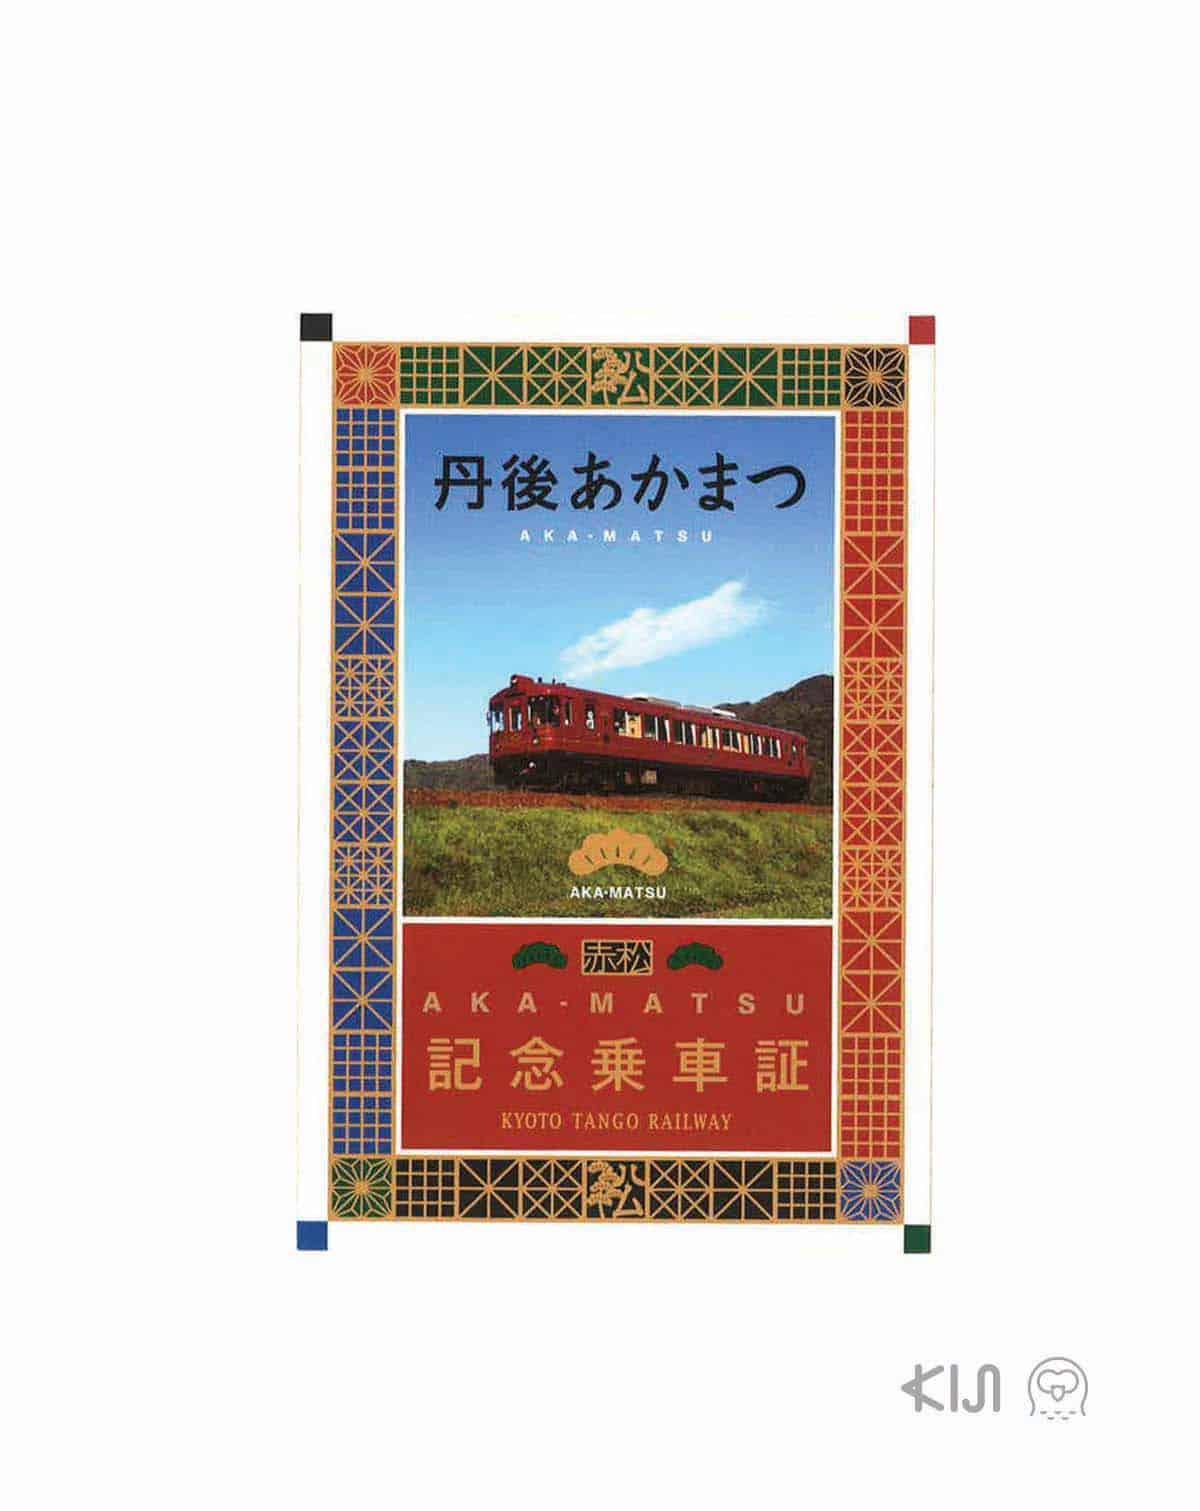 Kyoto Tango Railway โดยมีรถไฟทั้งหมด 3 ขบวน คือ Kuro-matsu(ต้นสนสีดำ) Aka-matsu (ต้นสนสีแดง) Ao-matsu (ต้นสนสีน้ำเงิน)